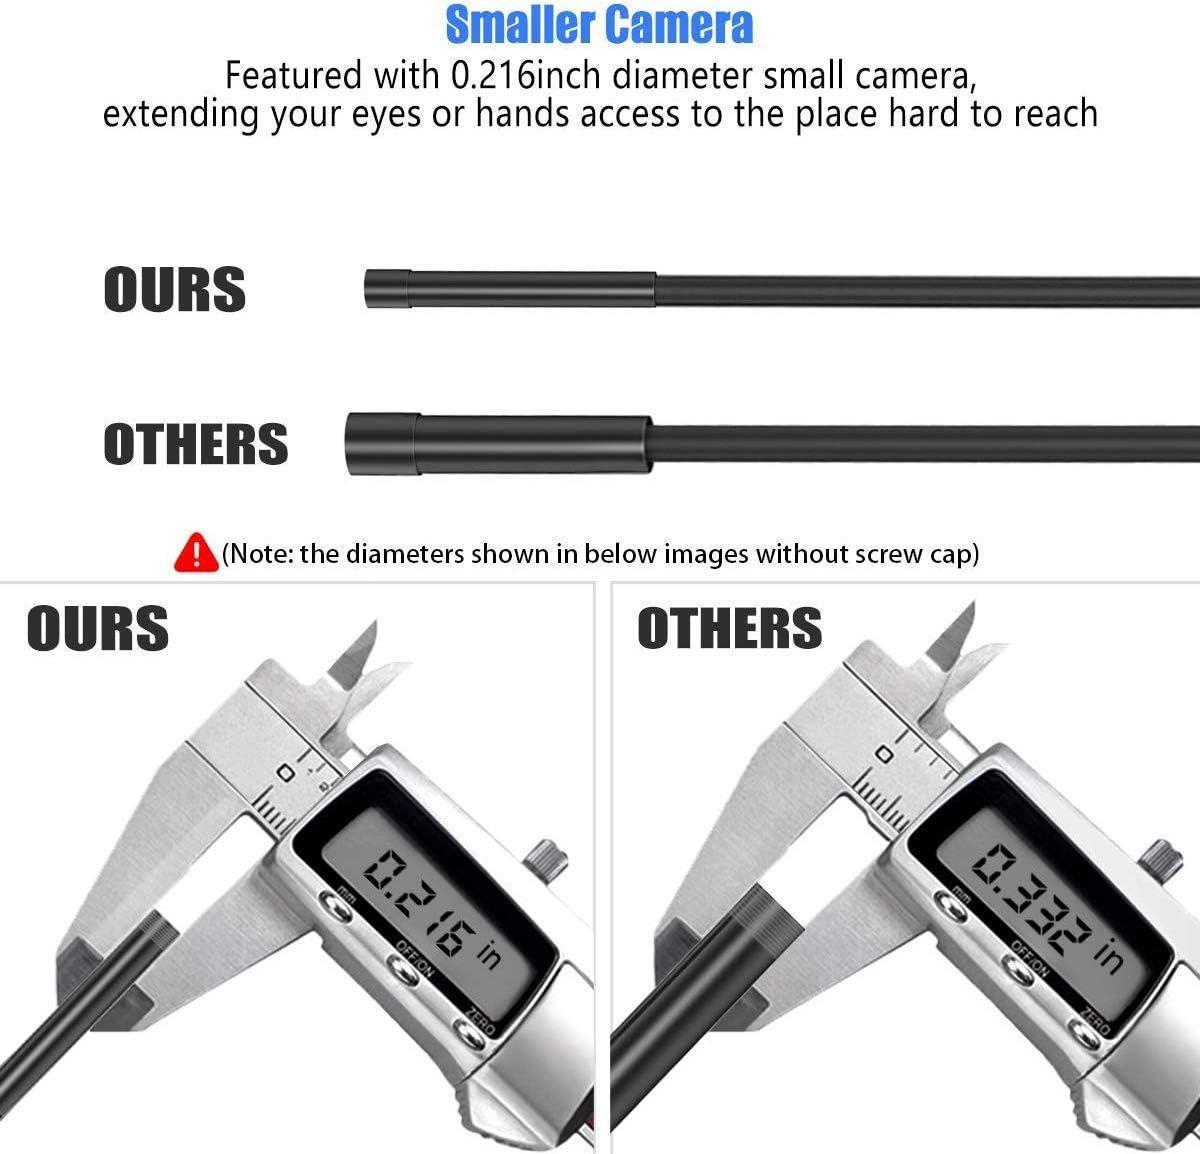 5,5mm Di/ámetro 5M Semirr/ígido Cable KZYEE WiFi Endoscopio 2,0 MP 1080P HD C/ámara de Inspecci/ón Reinicializaci/ón Impermeable para Android iOS Smartphone iPhone Samsung Tablet